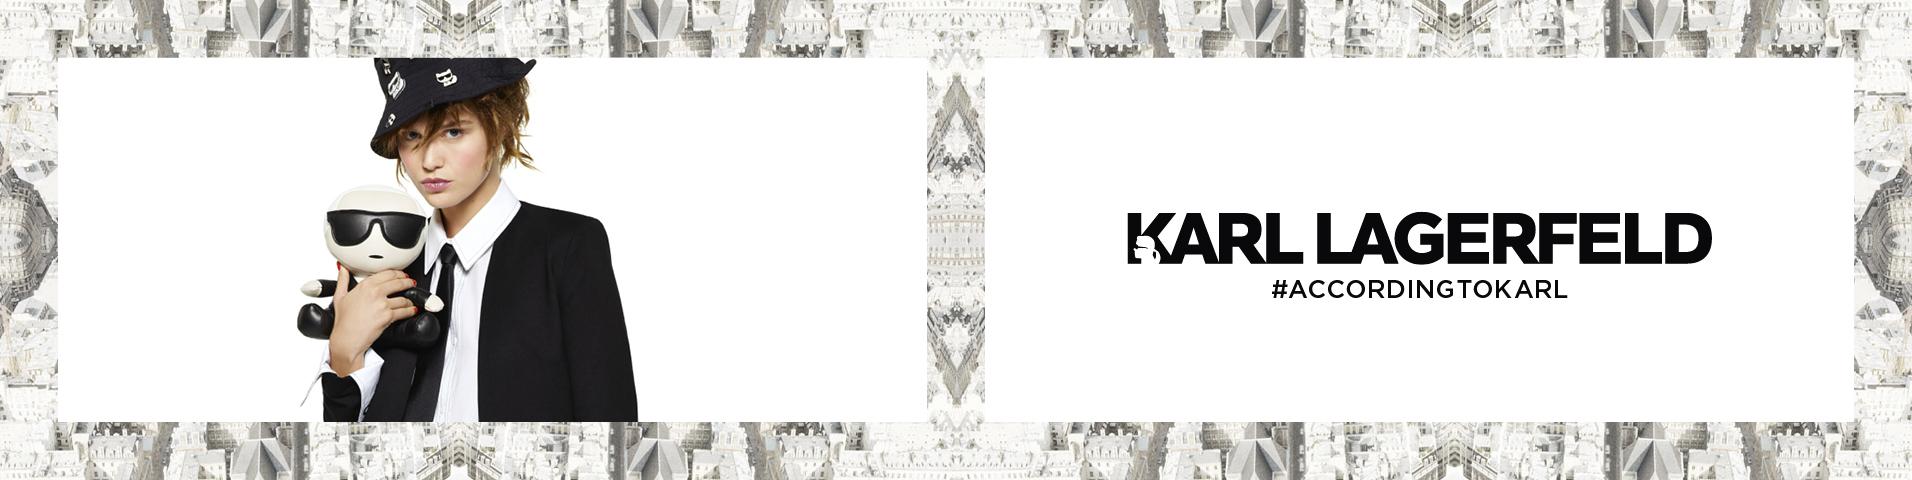 Catalogo KARL LAGERFELD 7a0cf27ae98